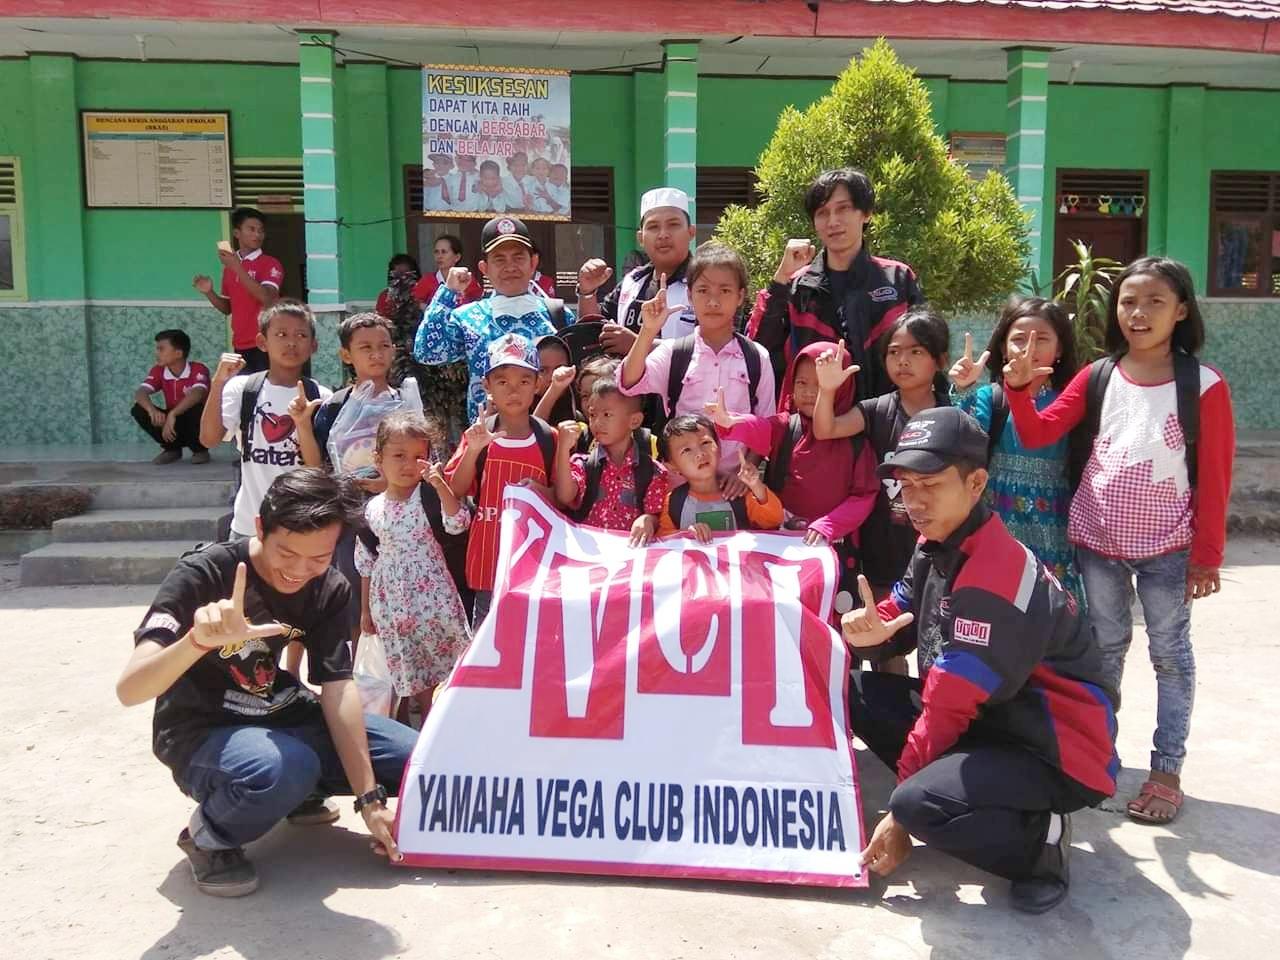 Yamaha Vega Club Indonesia Terus Bantu Korban Bencana Tsunami Selat Sunda